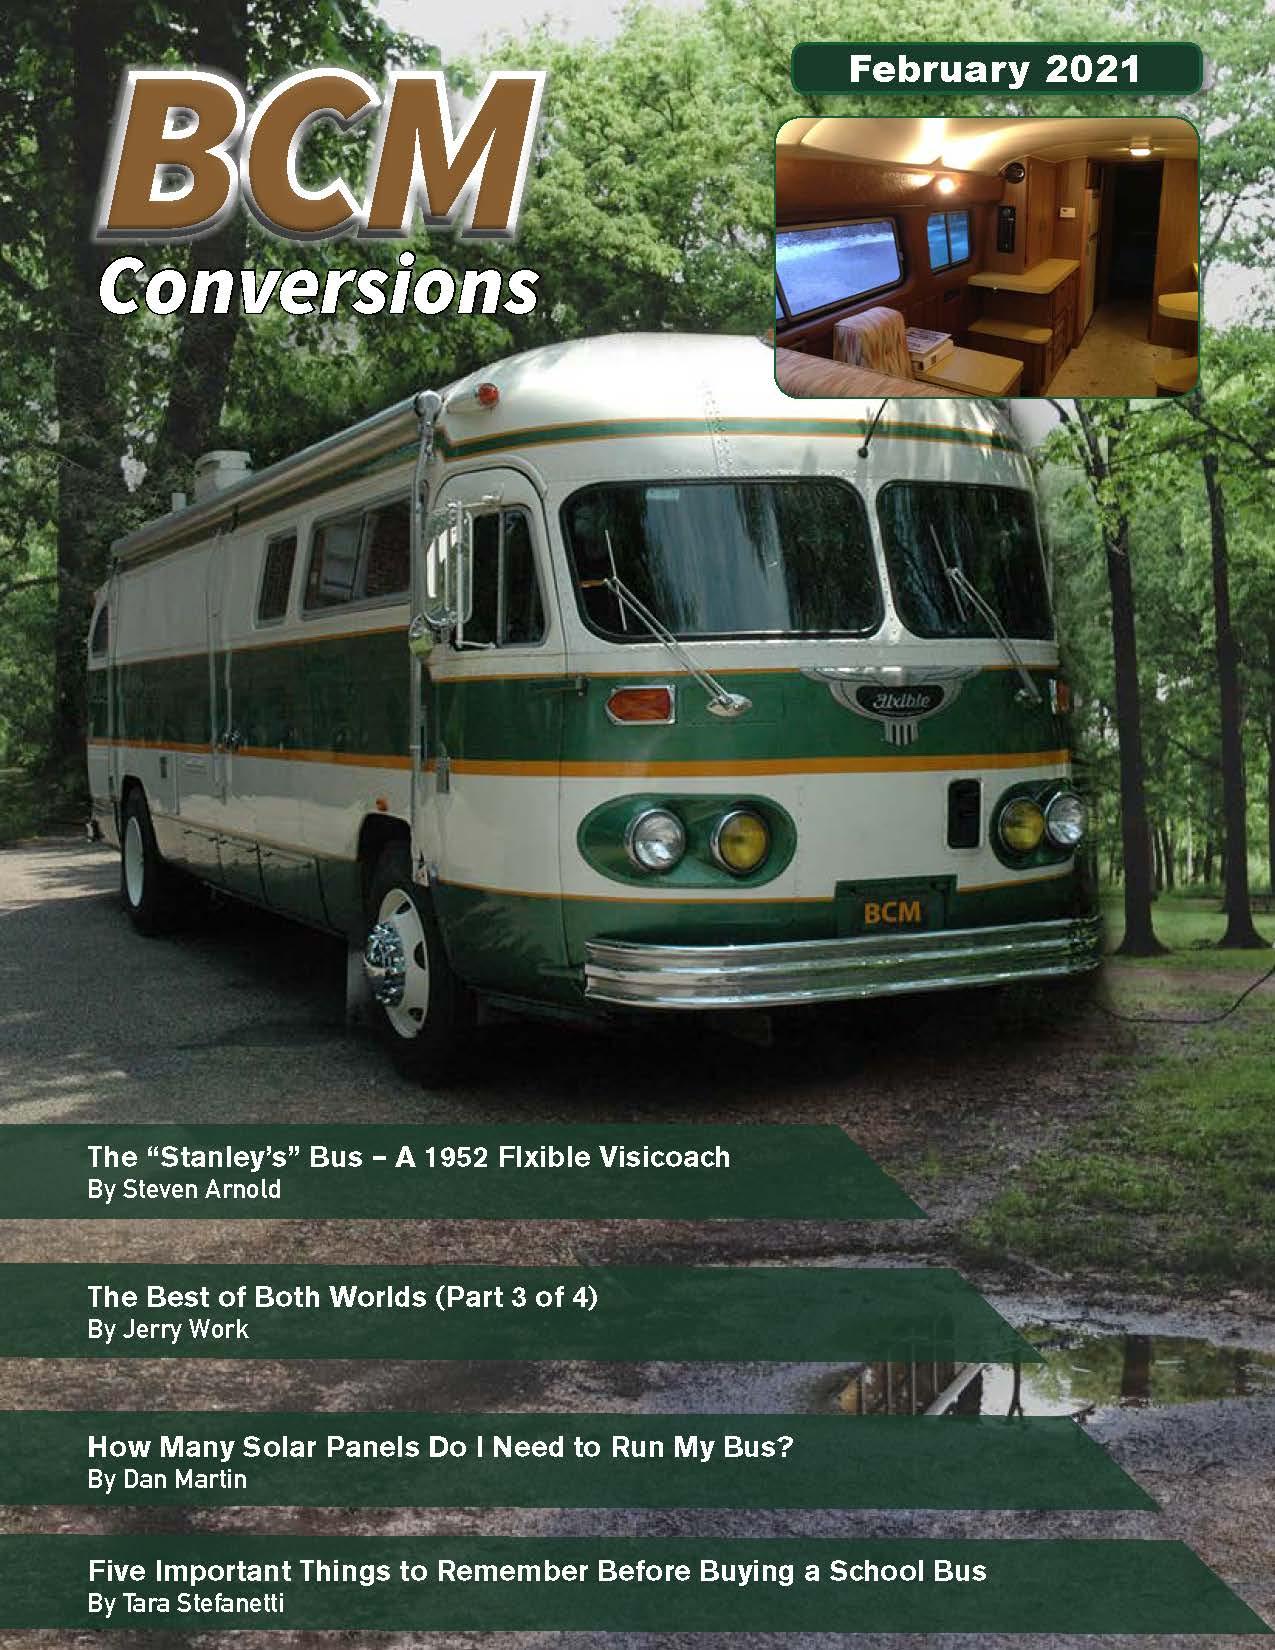 "<a href=""""><img class=""spu-open-10240"" src=""https://www.busconversionmagazine.com/wp-content/uploads/2021/02/February-Issue-2021-Toc.jpg""/></a>"